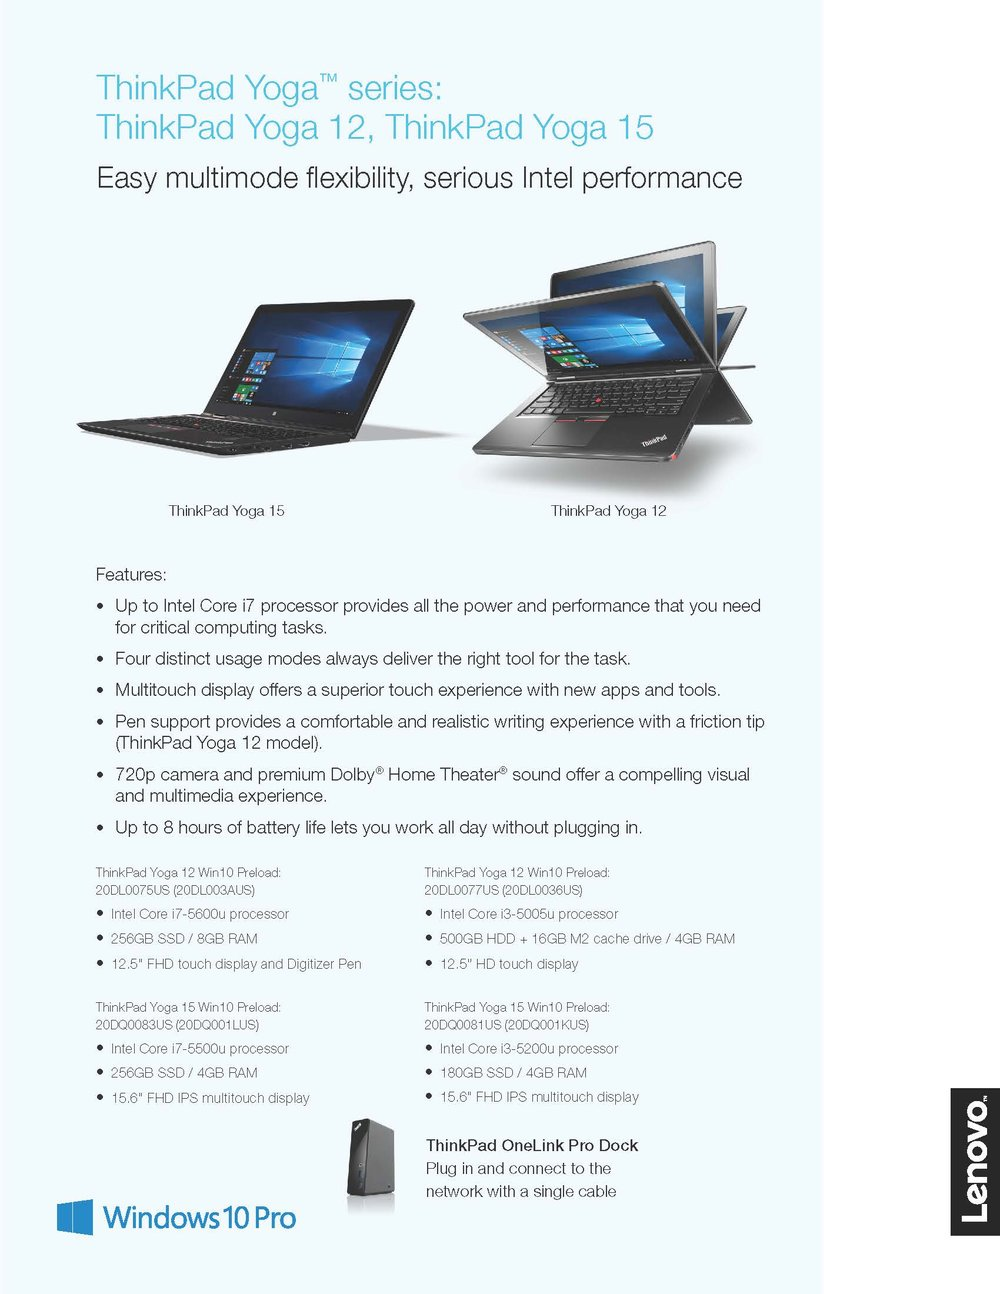 Product Famlily Brochure_SH_011816_1200_v21_Page_4.jpg